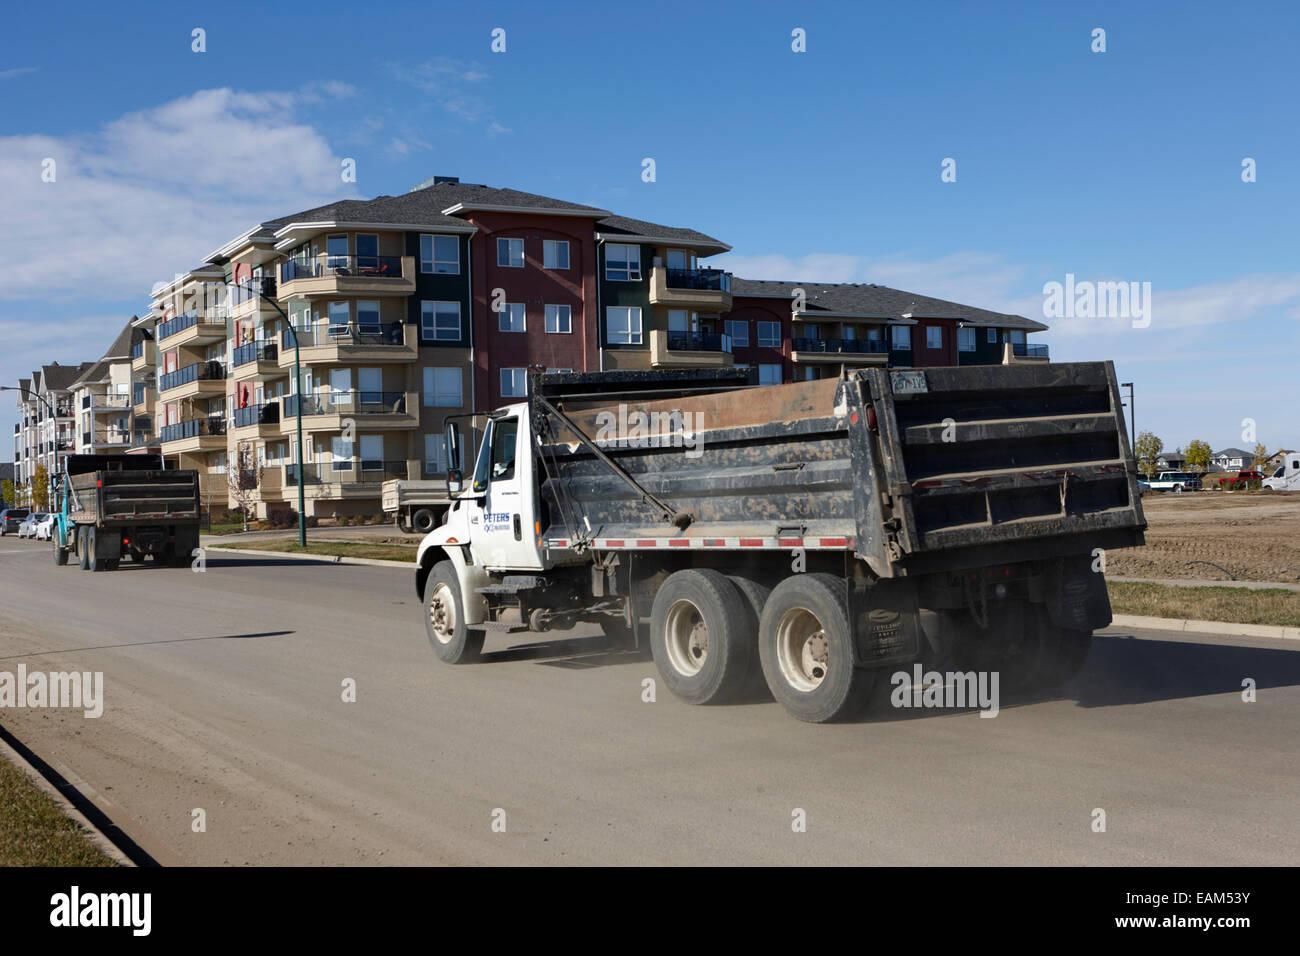 construction dump trucks at new condominium building in suburban neighbourhood saskatoon Saskatchewan Canada - Stock Image